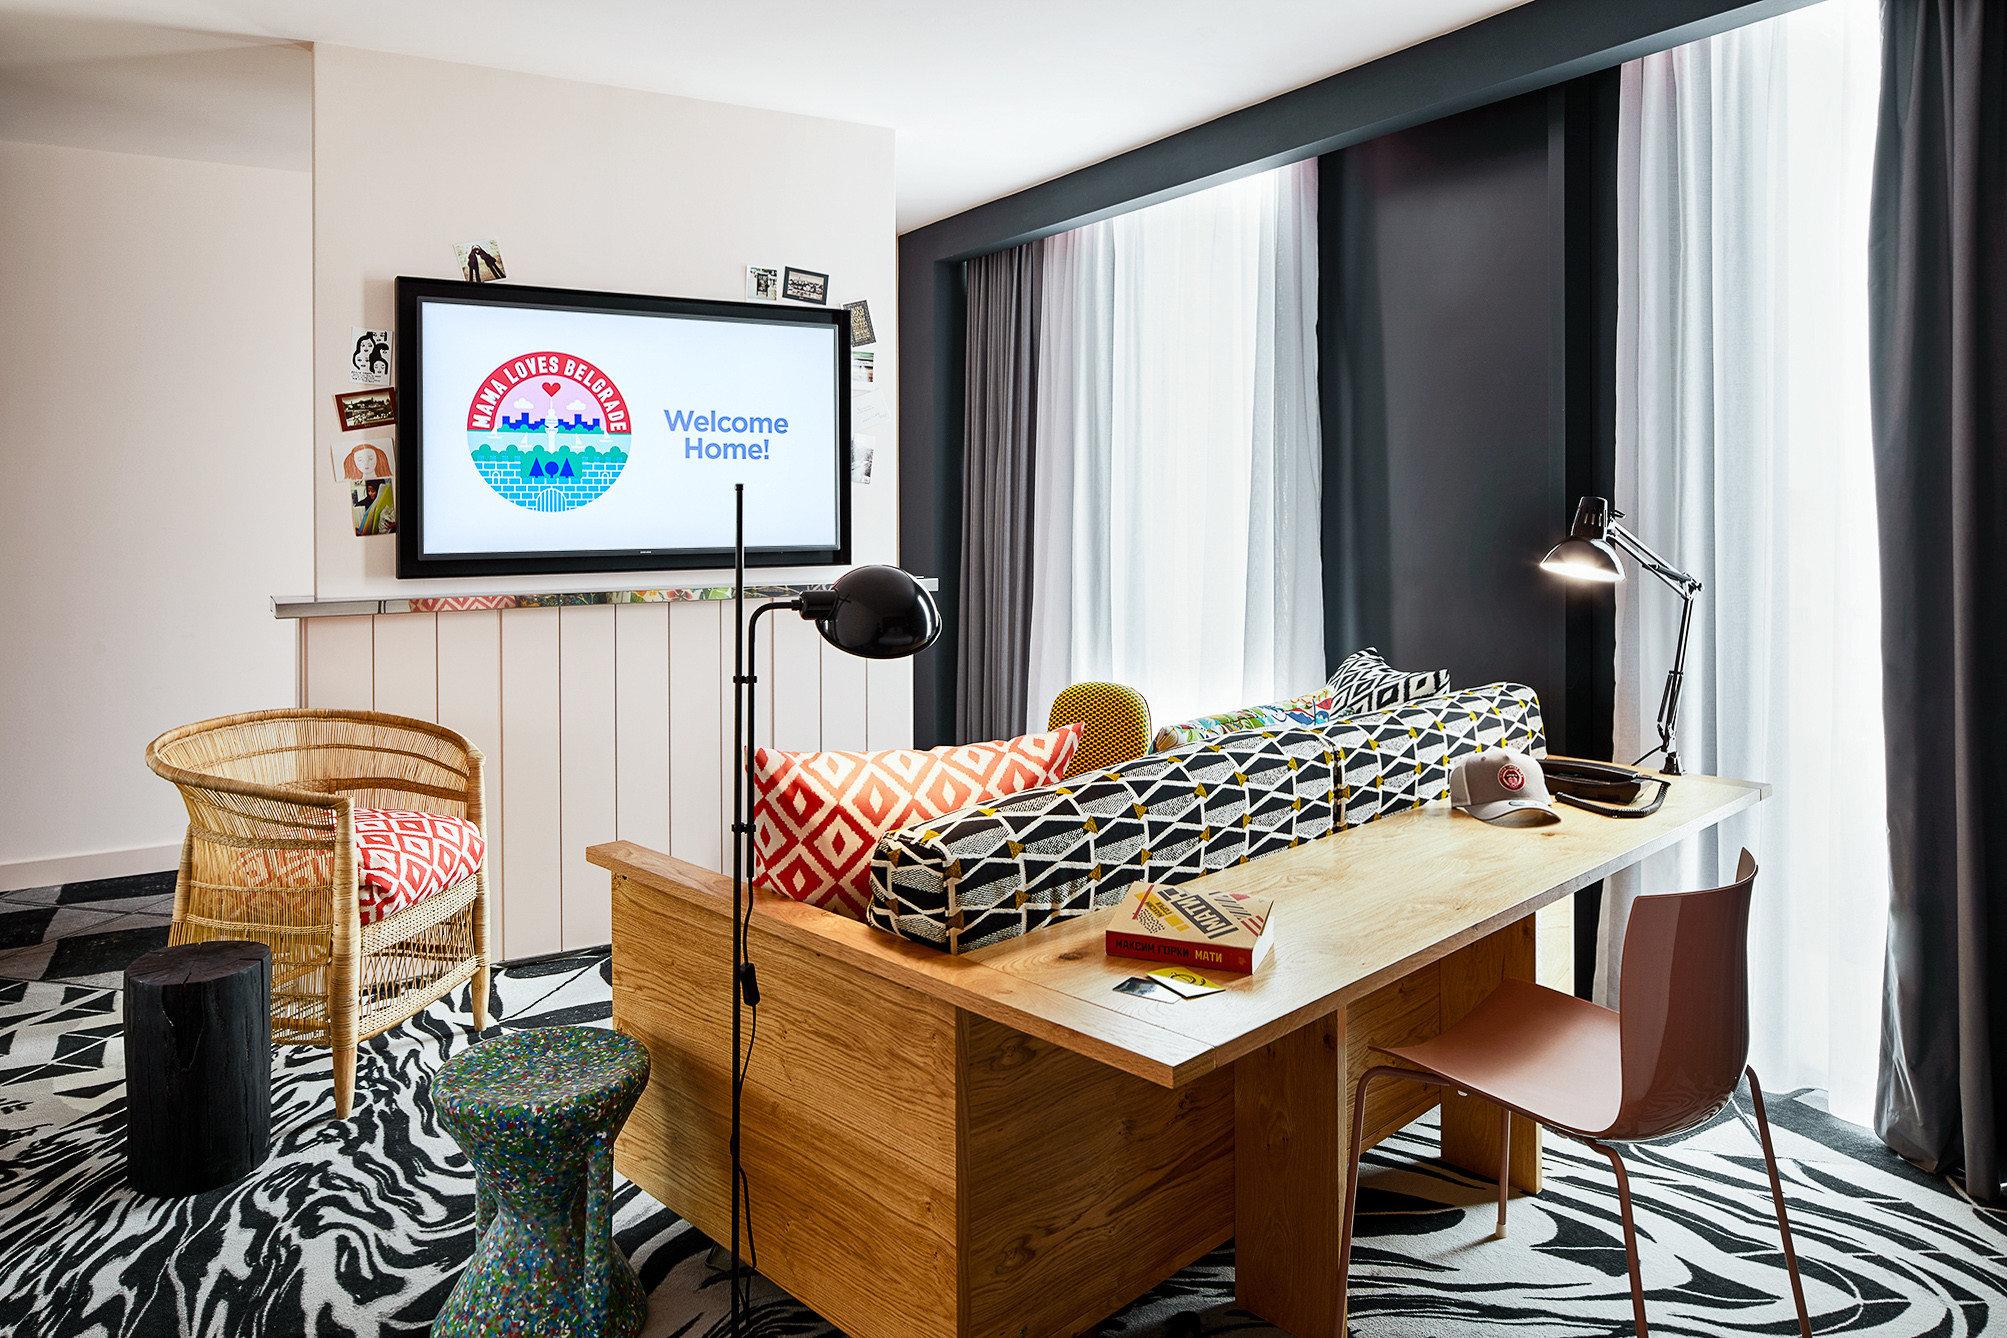 europe Trip Ideas wall indoor floor Living room window furniture interior design office product